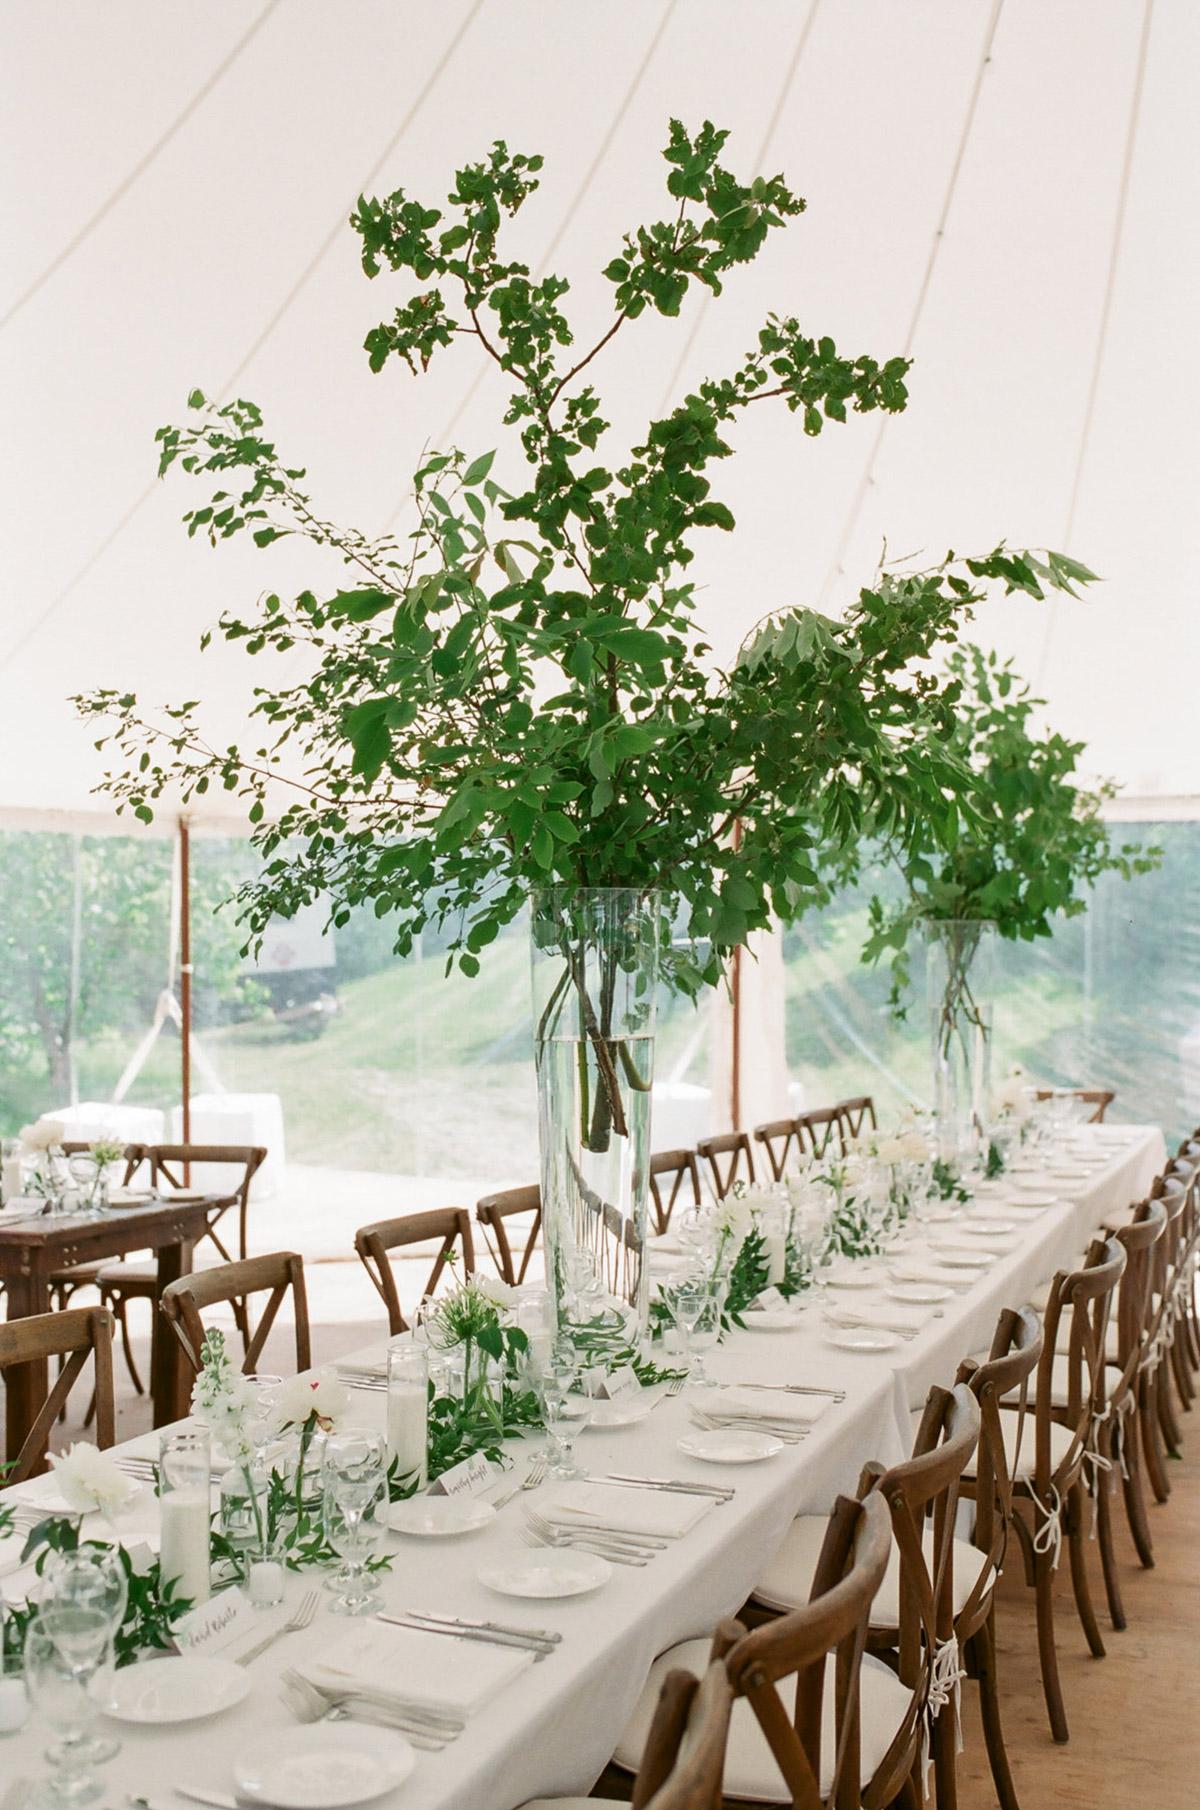 artiese-studios-vineyard-bride-swish-list-private-estate-cambridge-wedding-32.jpg